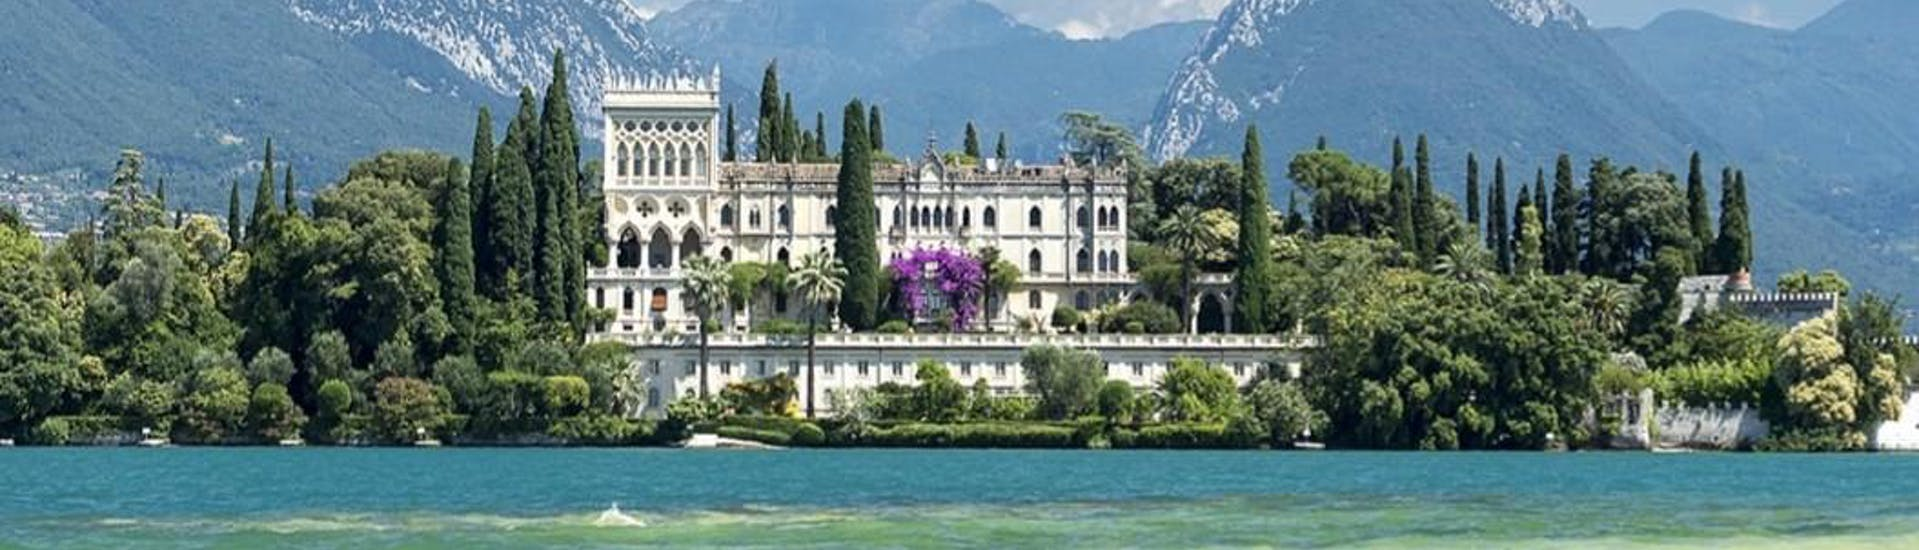 Boat Trip from Desenzano to the Castles of Lake Garda with Bertoldi Boats Lago di Garda - Hero image